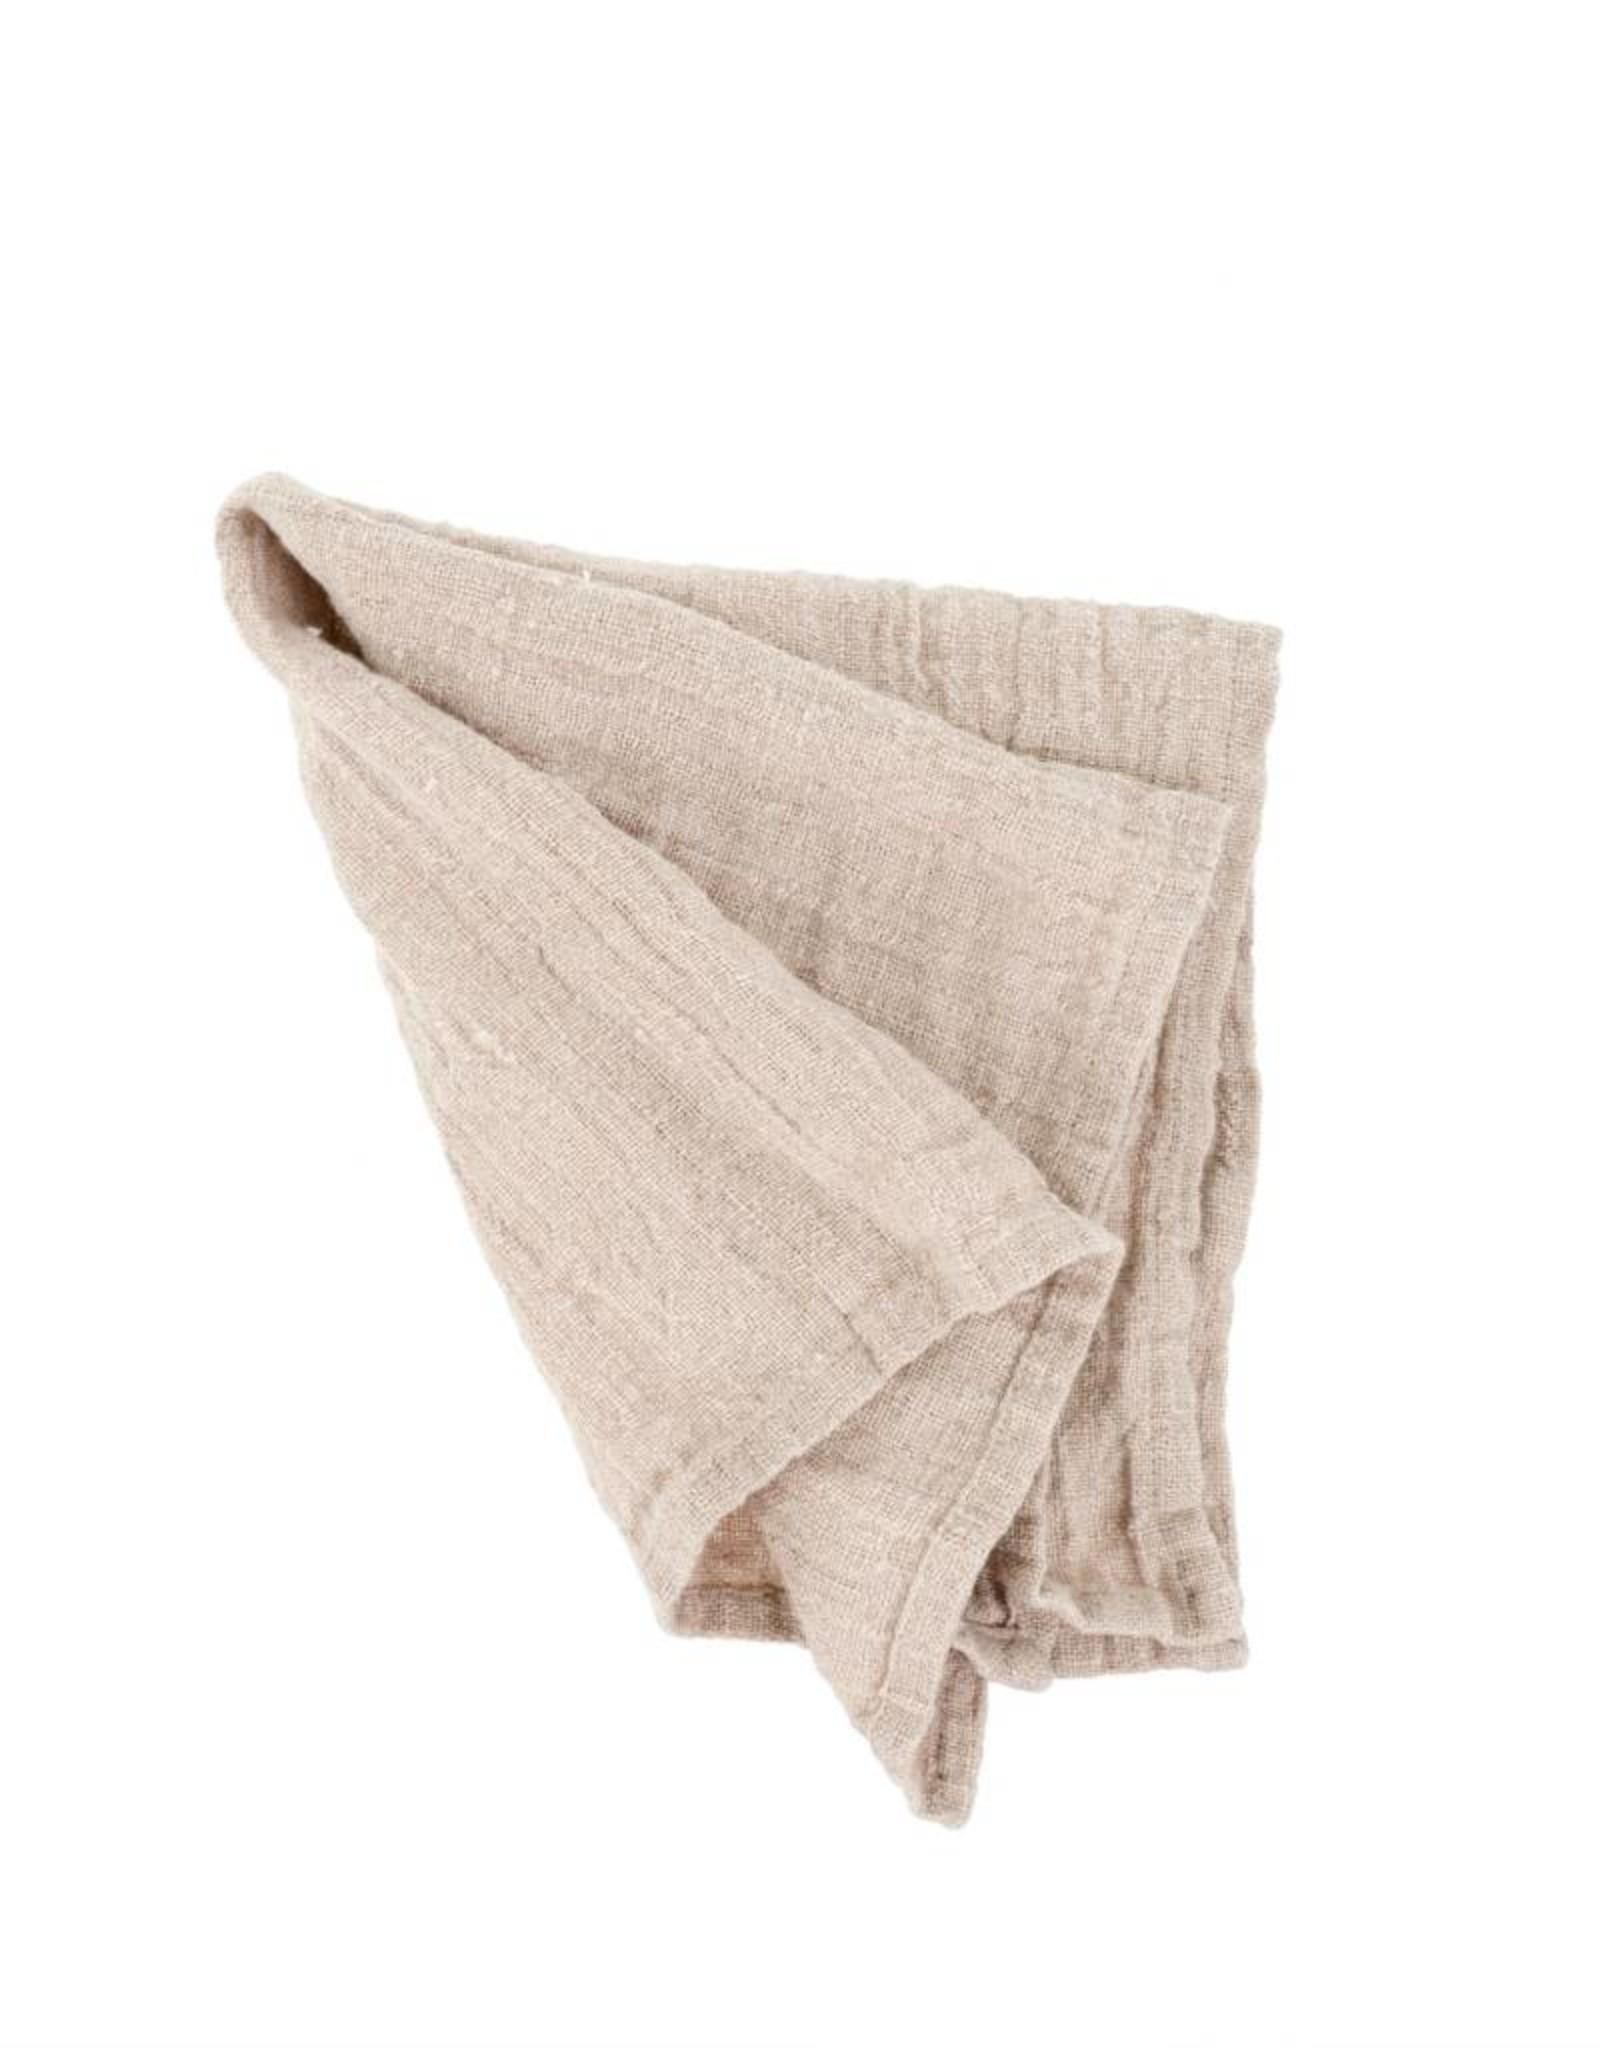 Indaba Rustic Linen Napkin - Blush